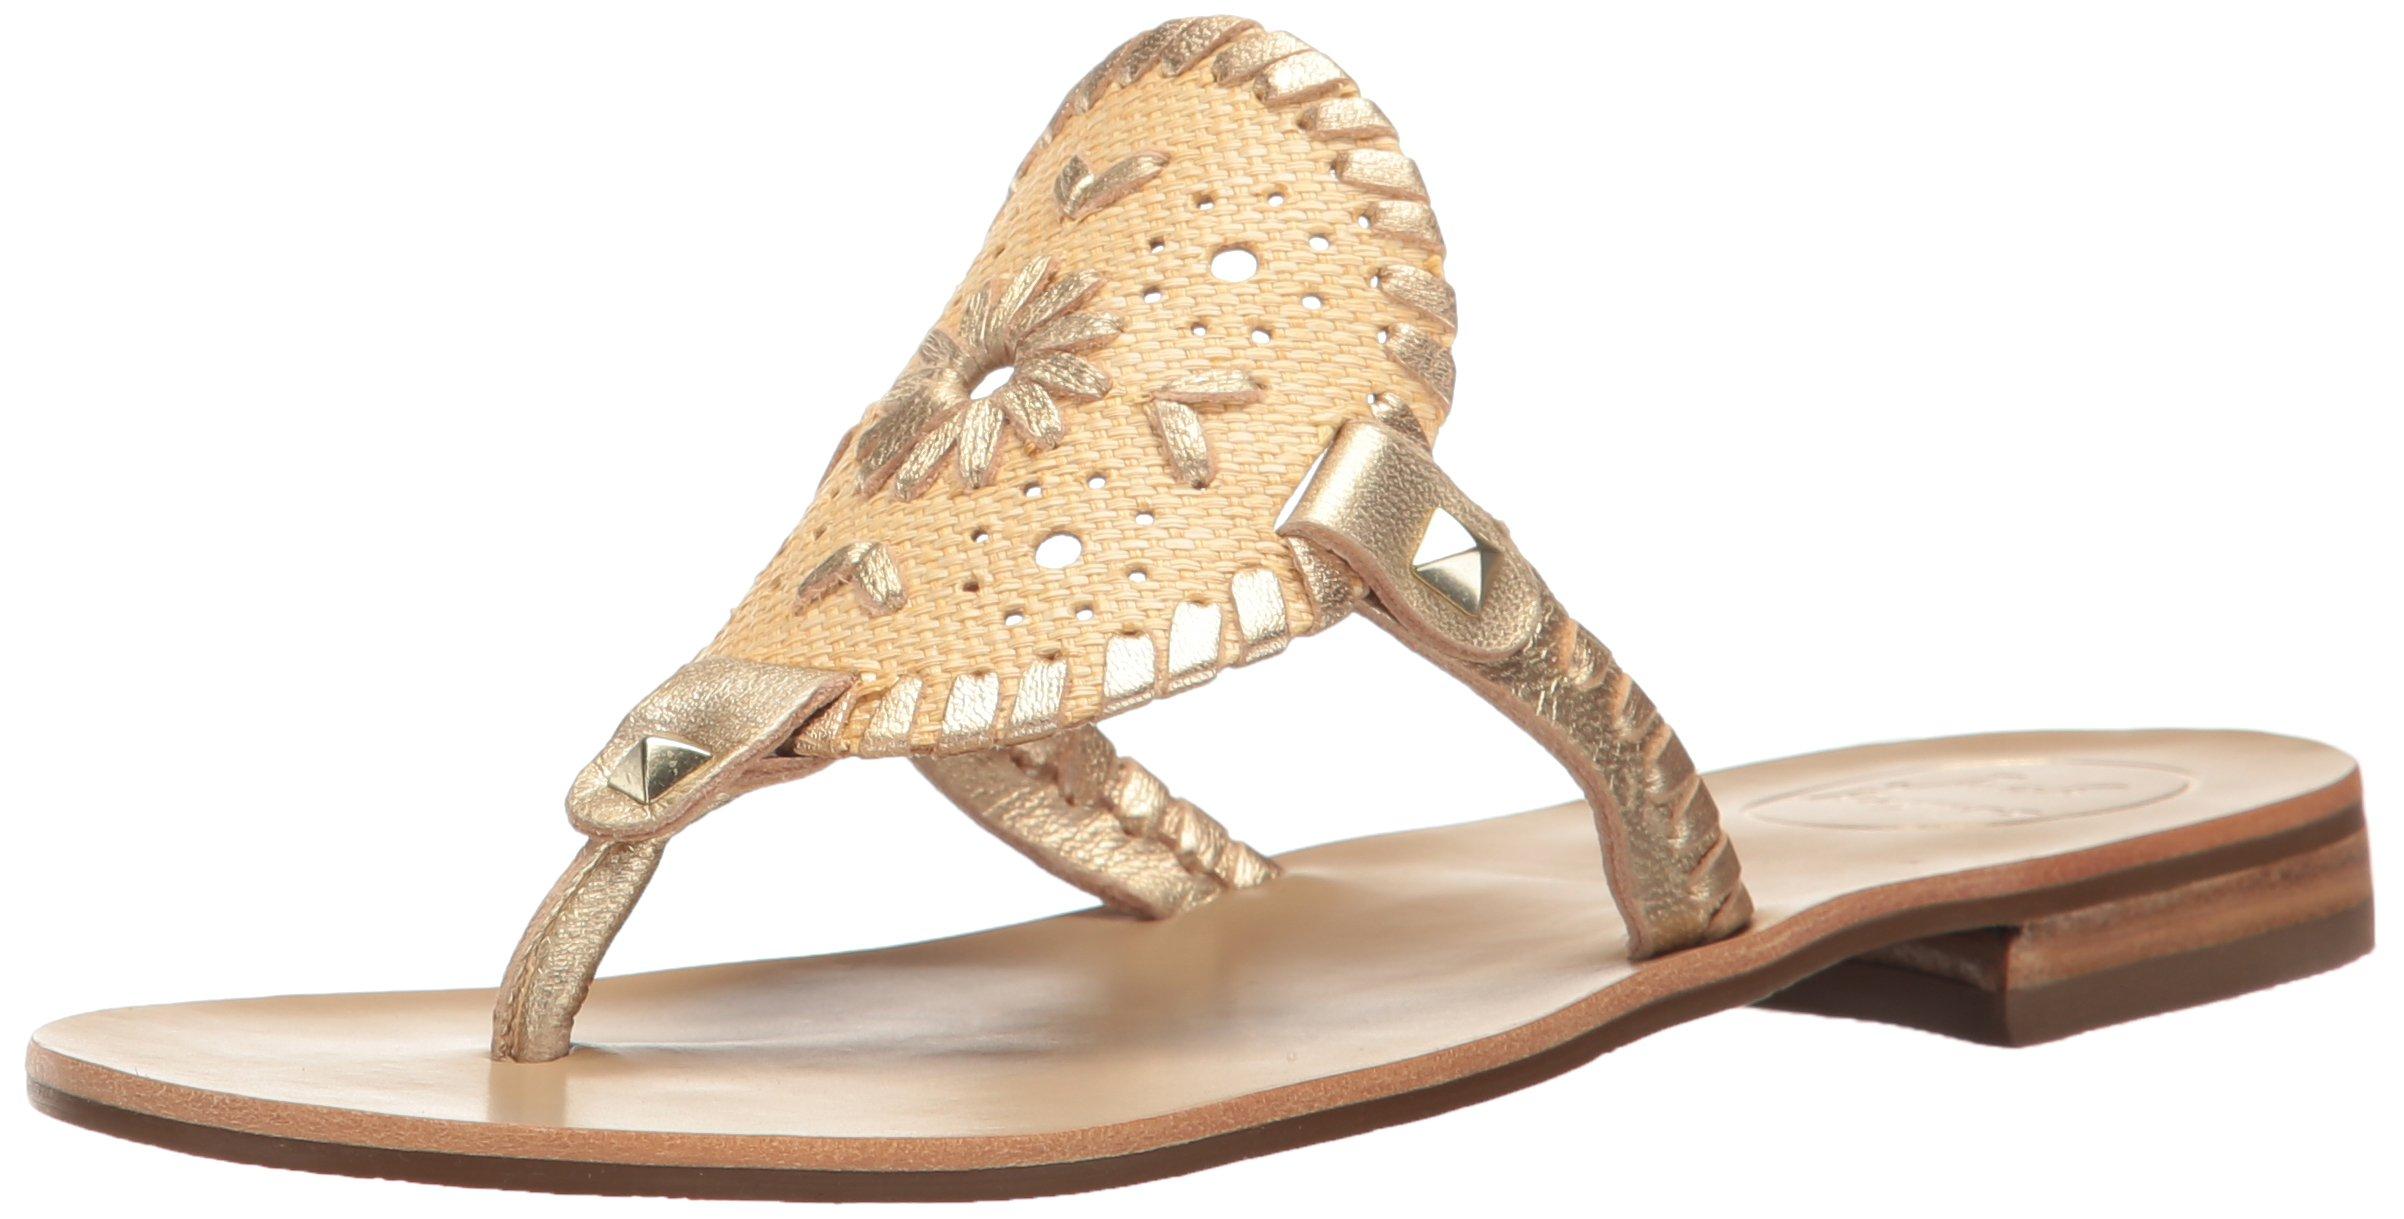 Jack Rogers Women's Georgica Raffia Dress Sandal, Natural Gold, 8 M US